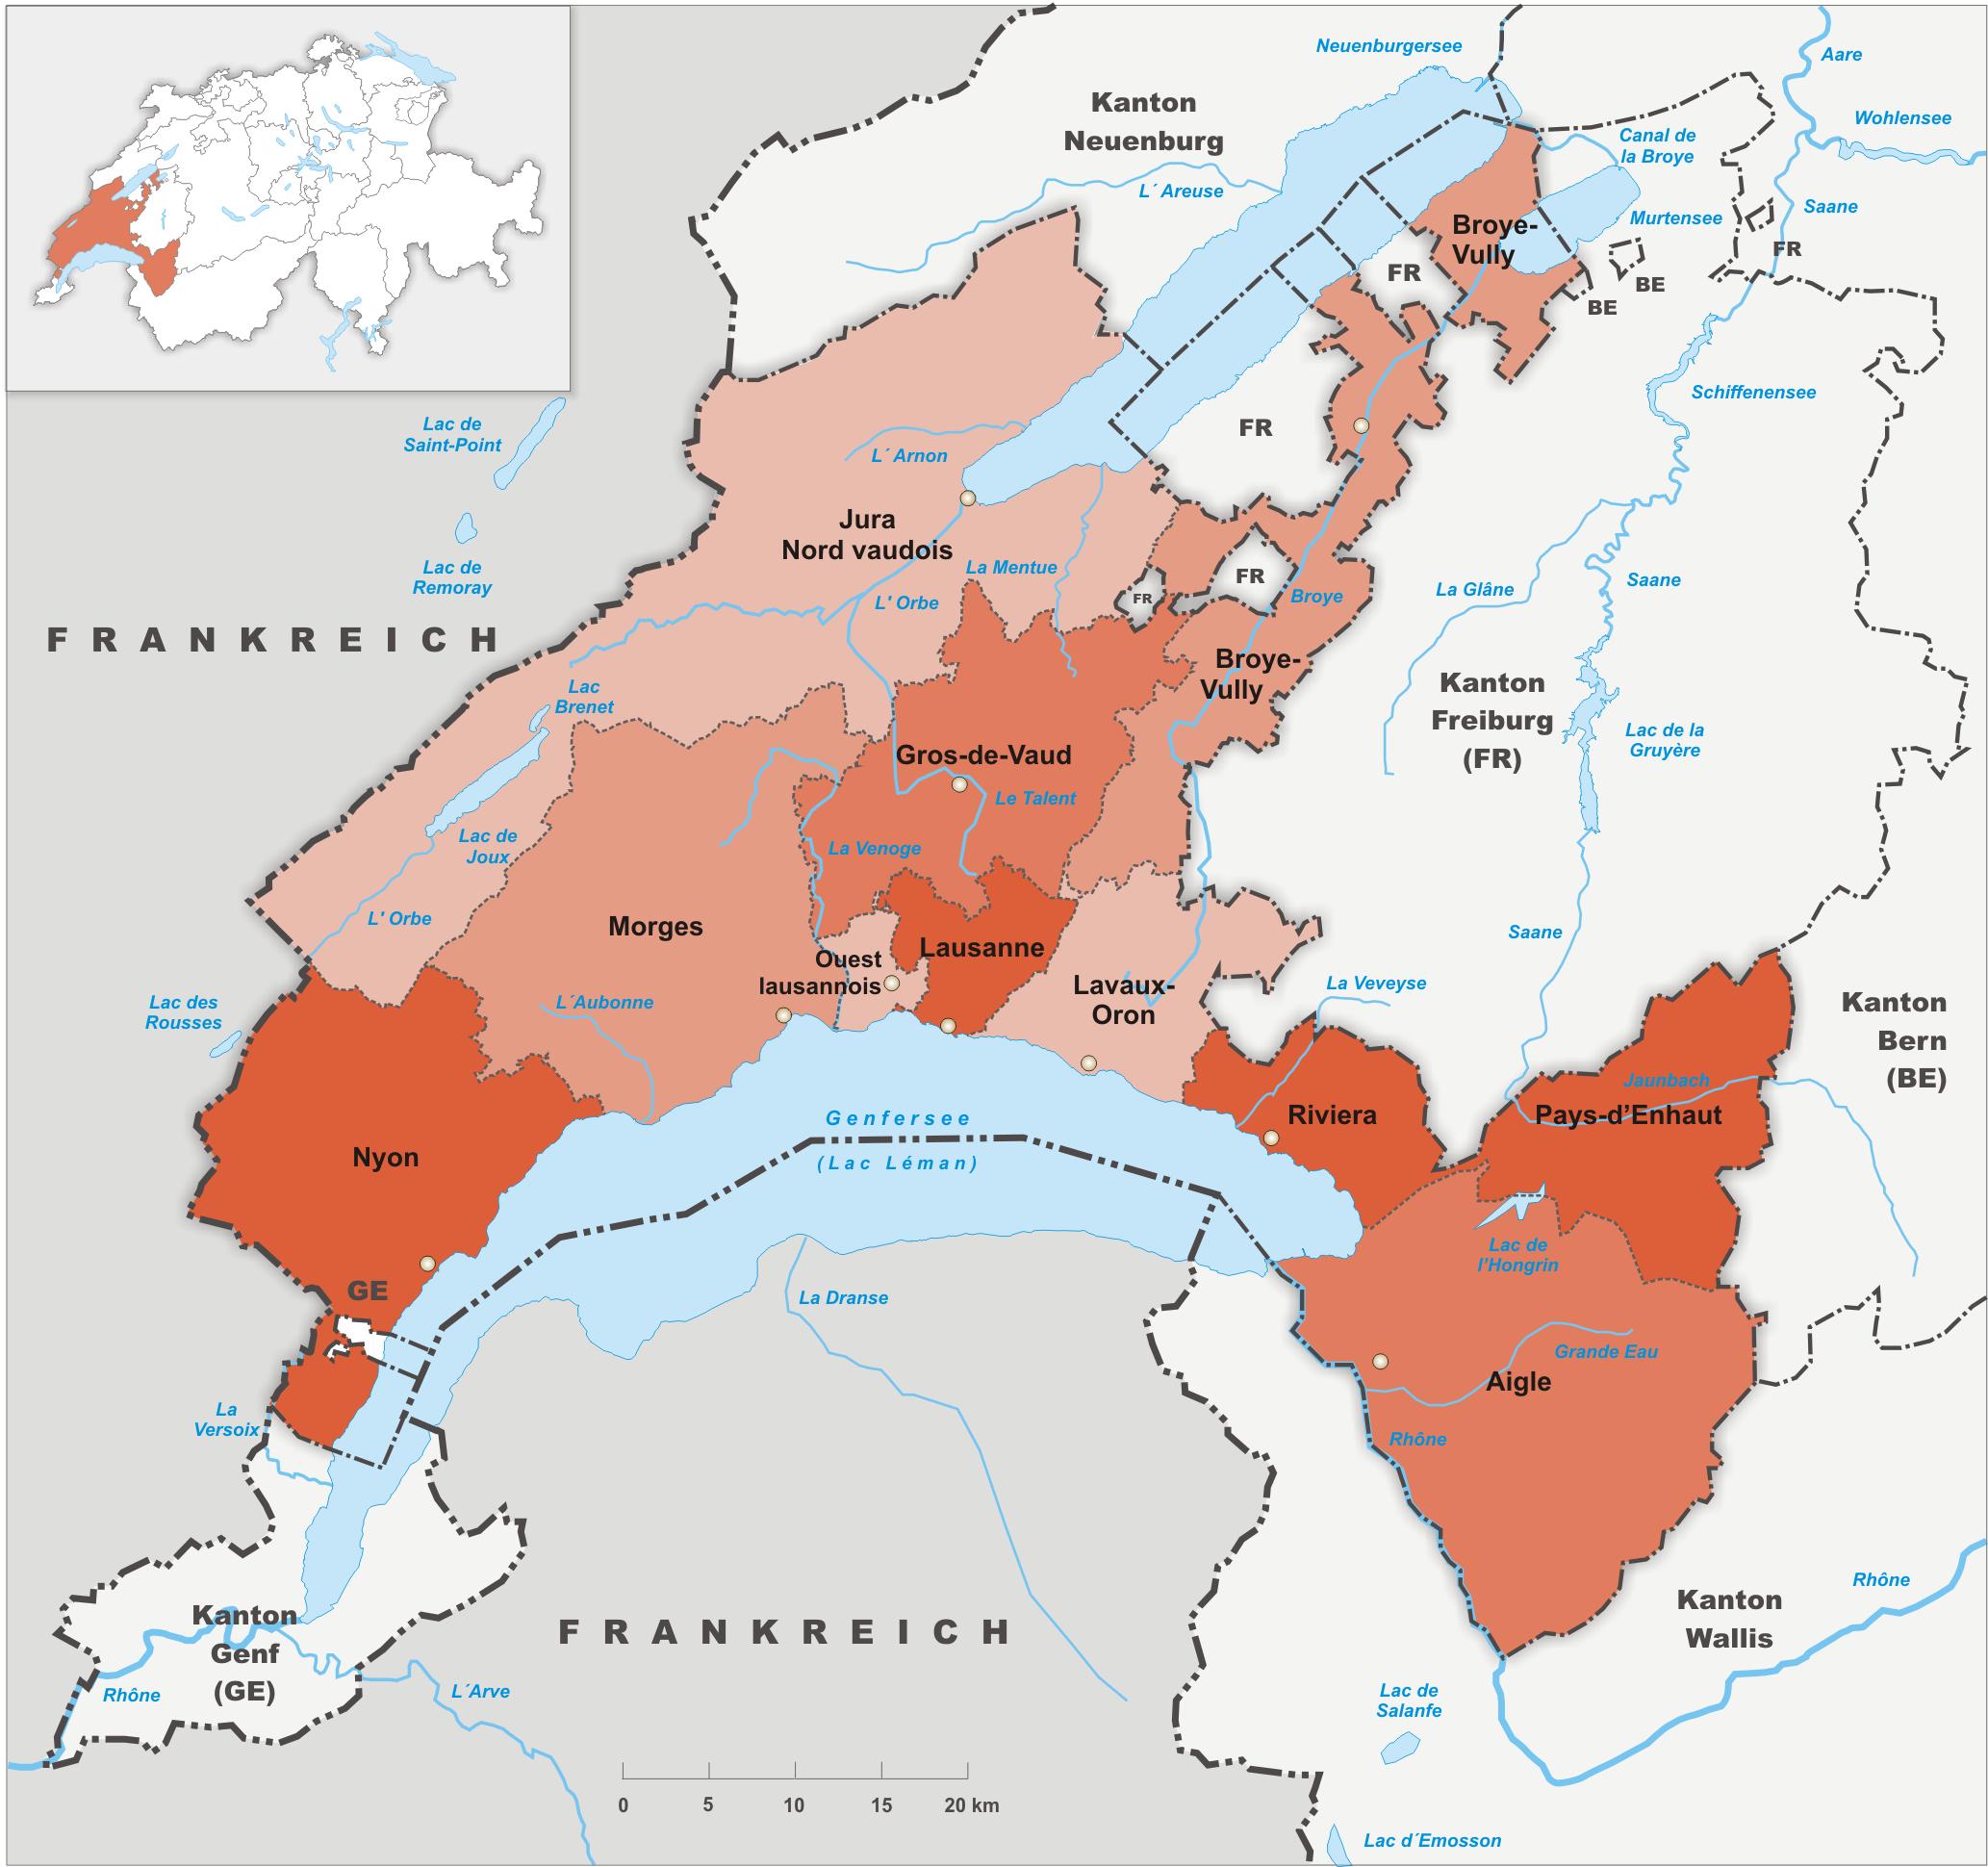 Bezirke des Kantons Waadt ab 2008